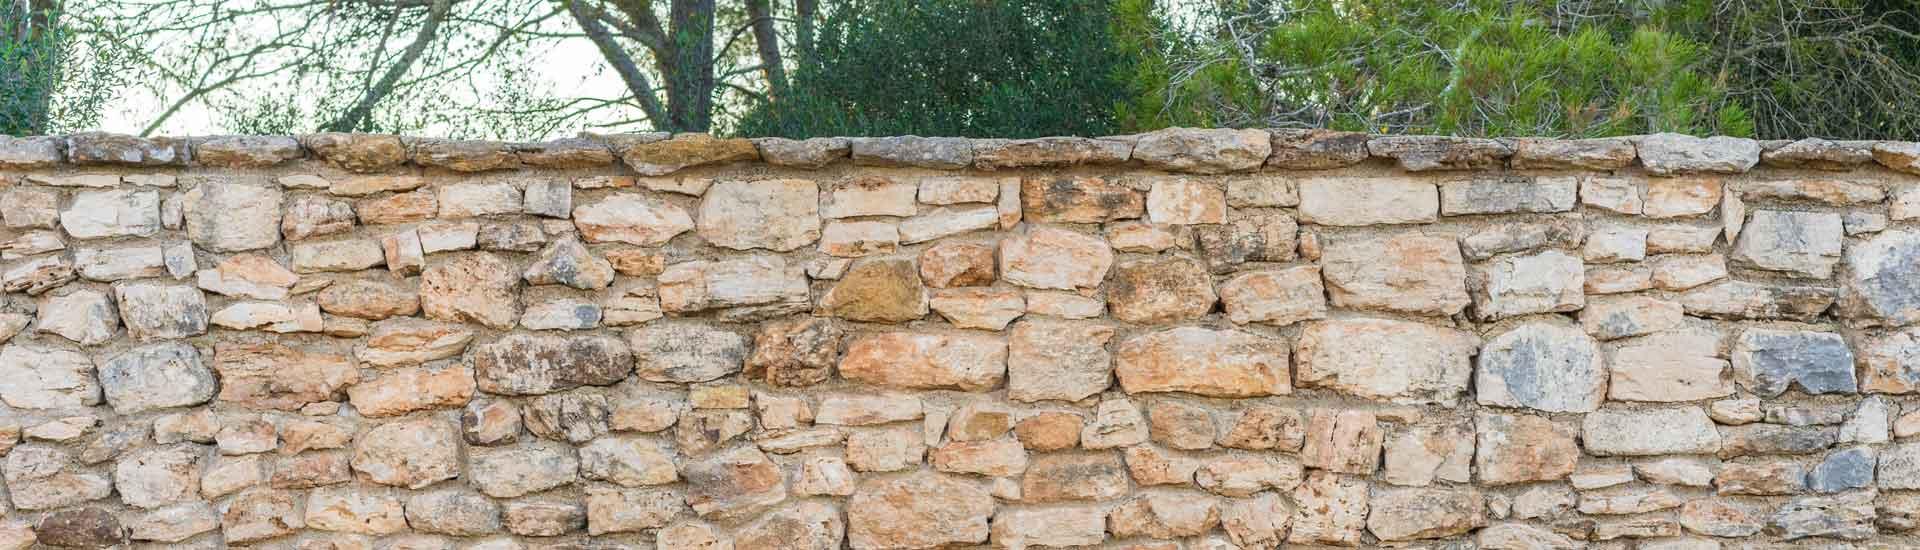 Construction de mur en pierre de jardin